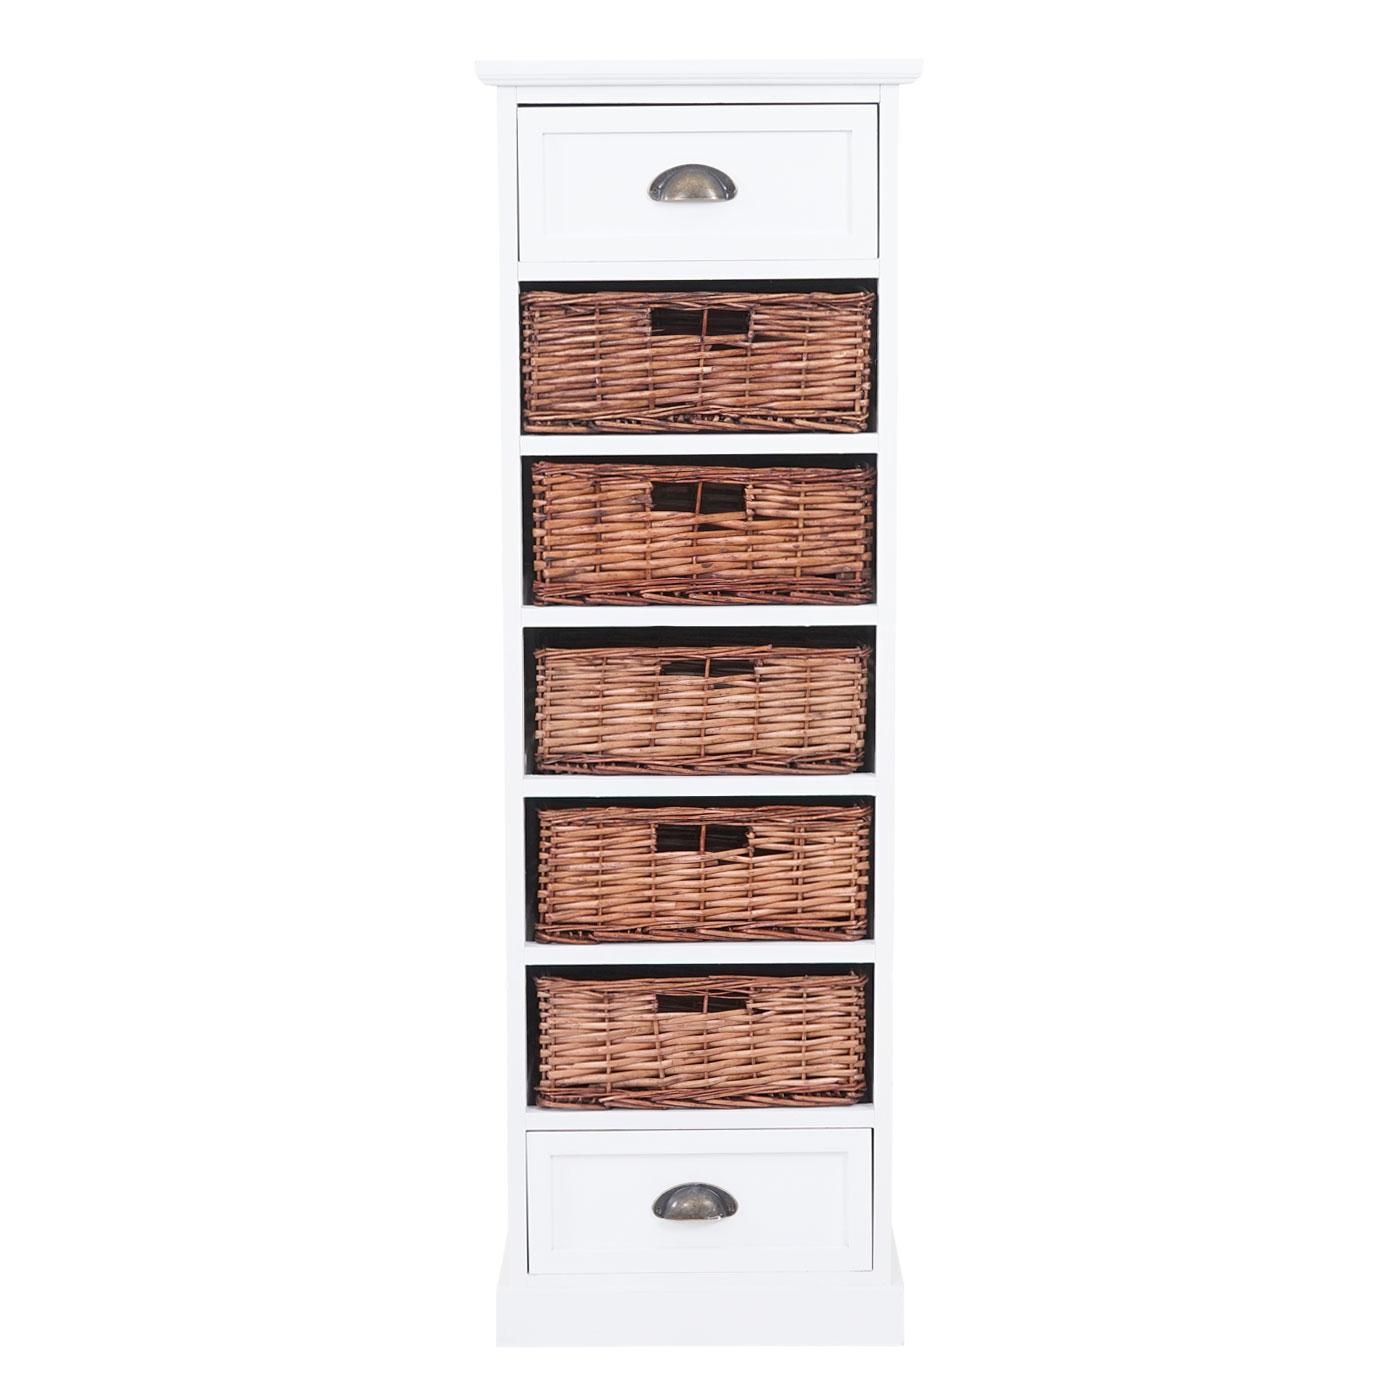 de tiroir armoire étagère 2 tiroirs 5 paniers Blanc 120x40x30cm Commode Nancy